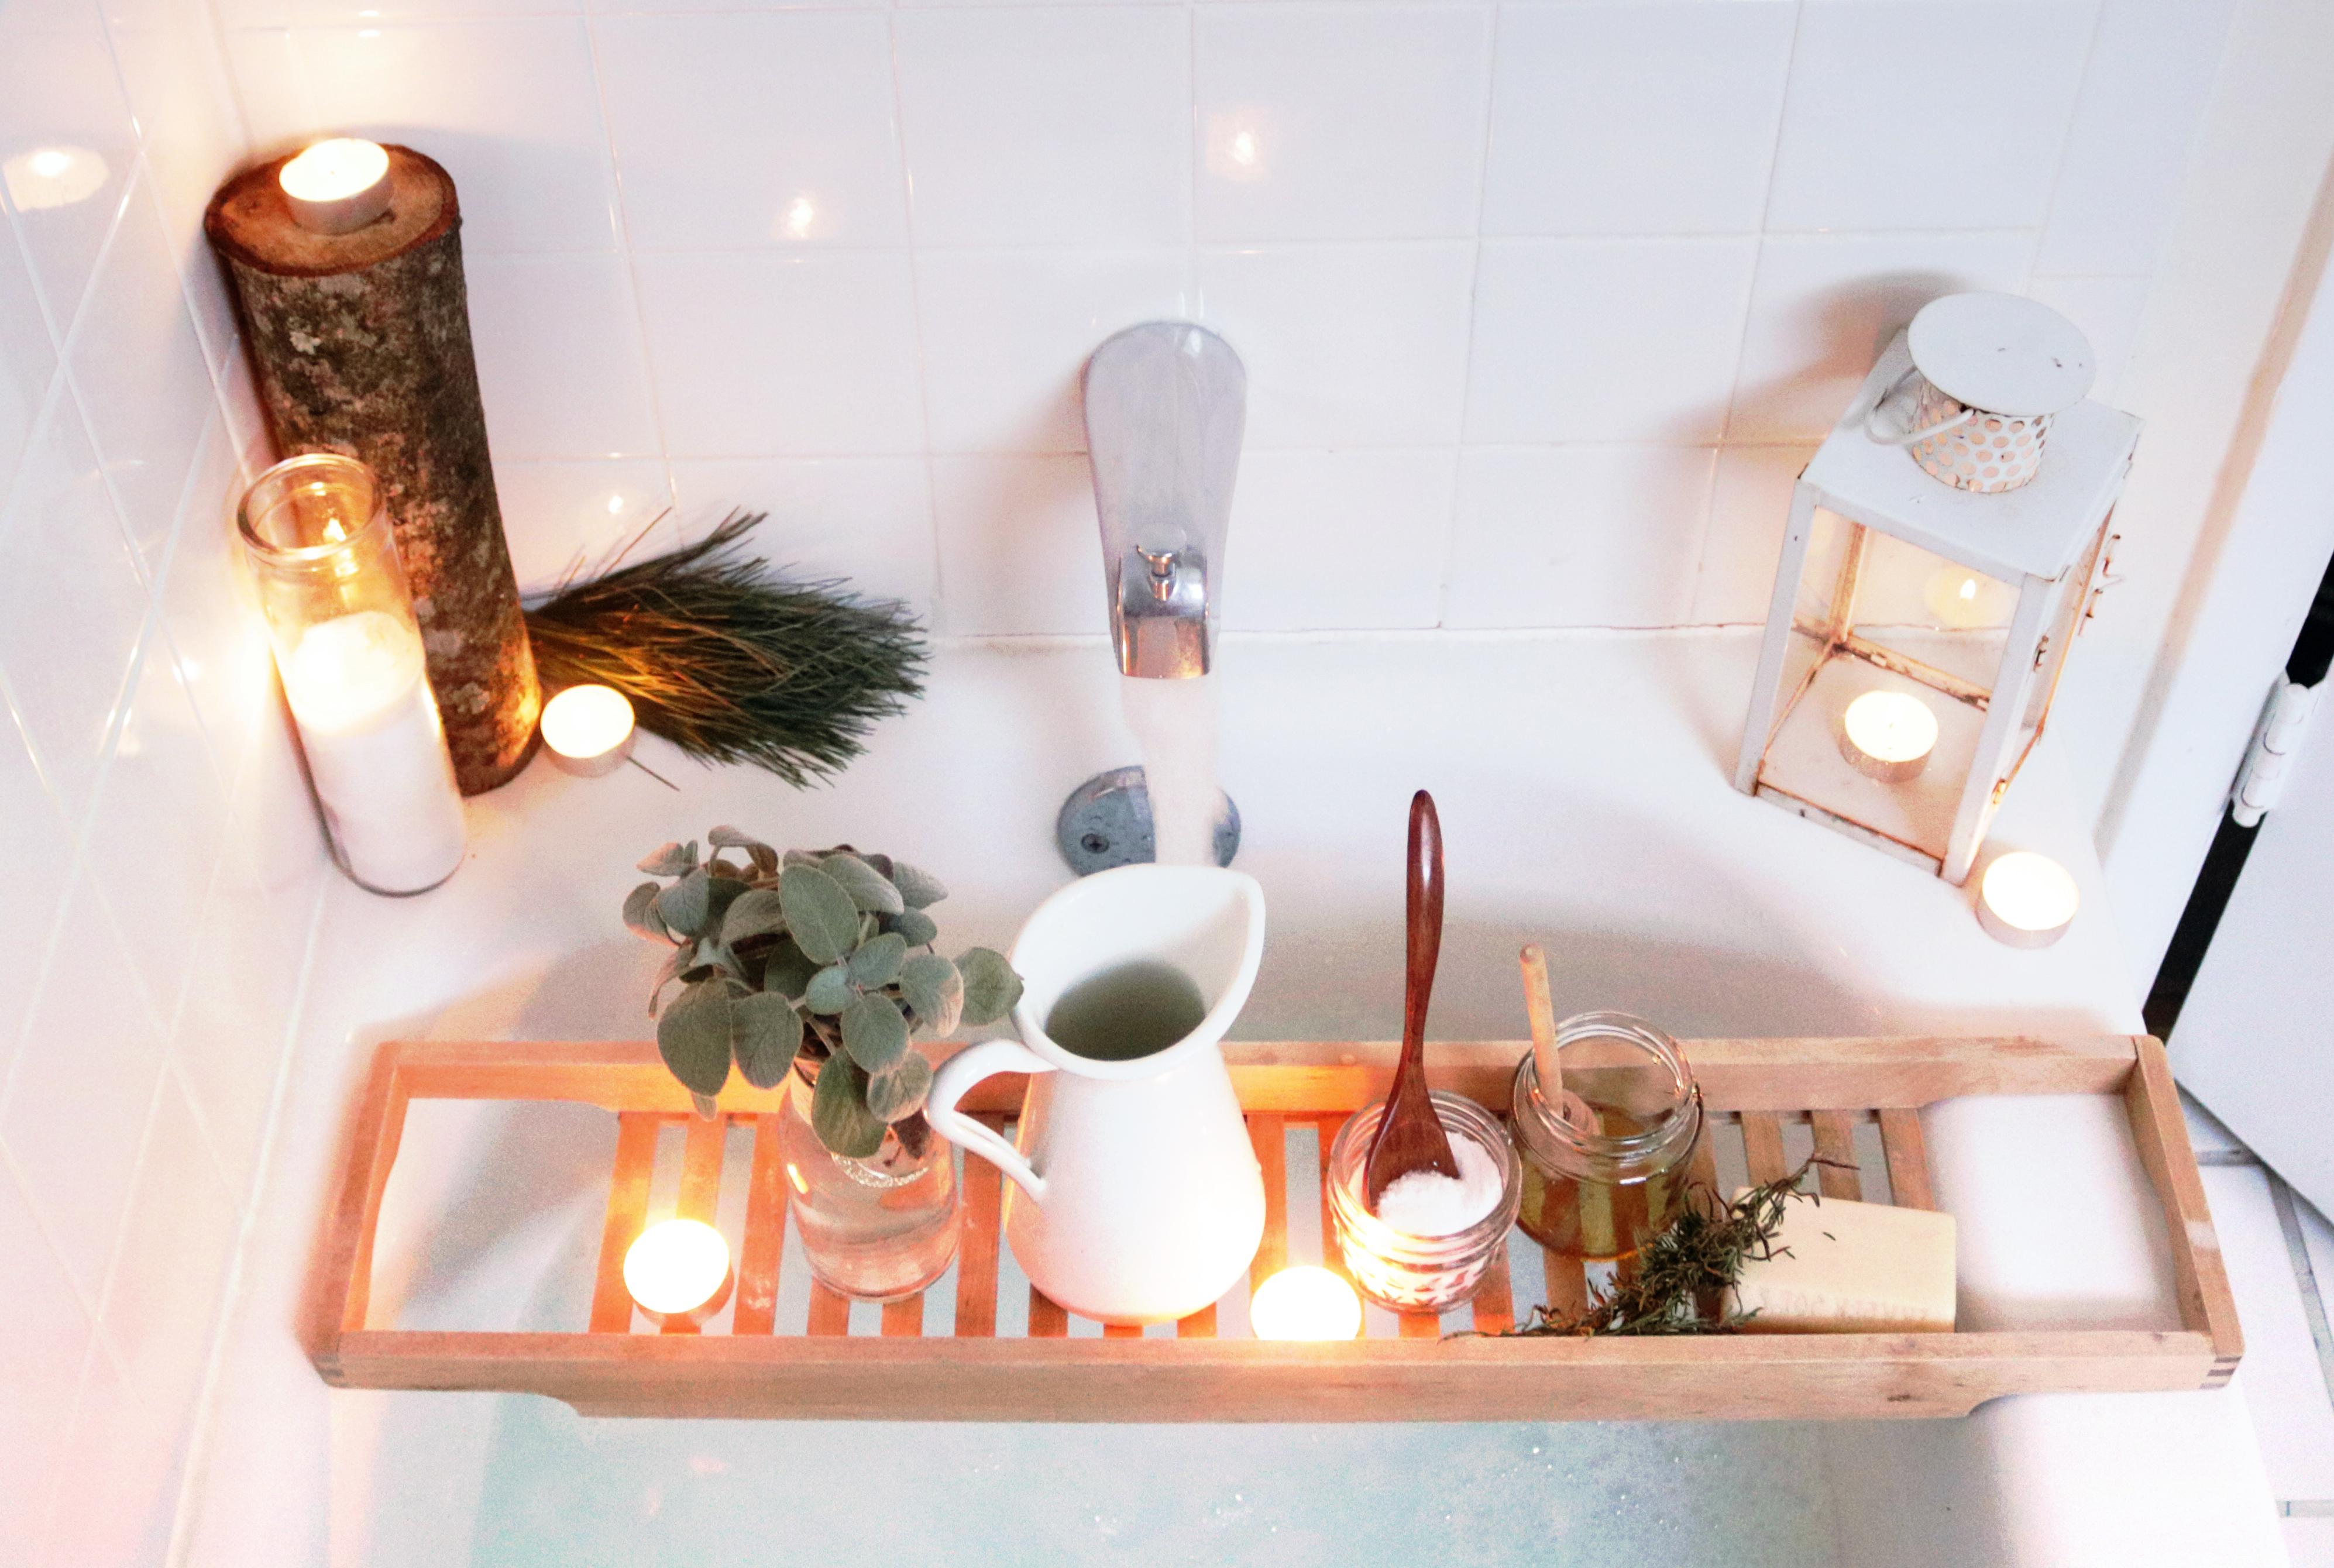 imbolc bath set